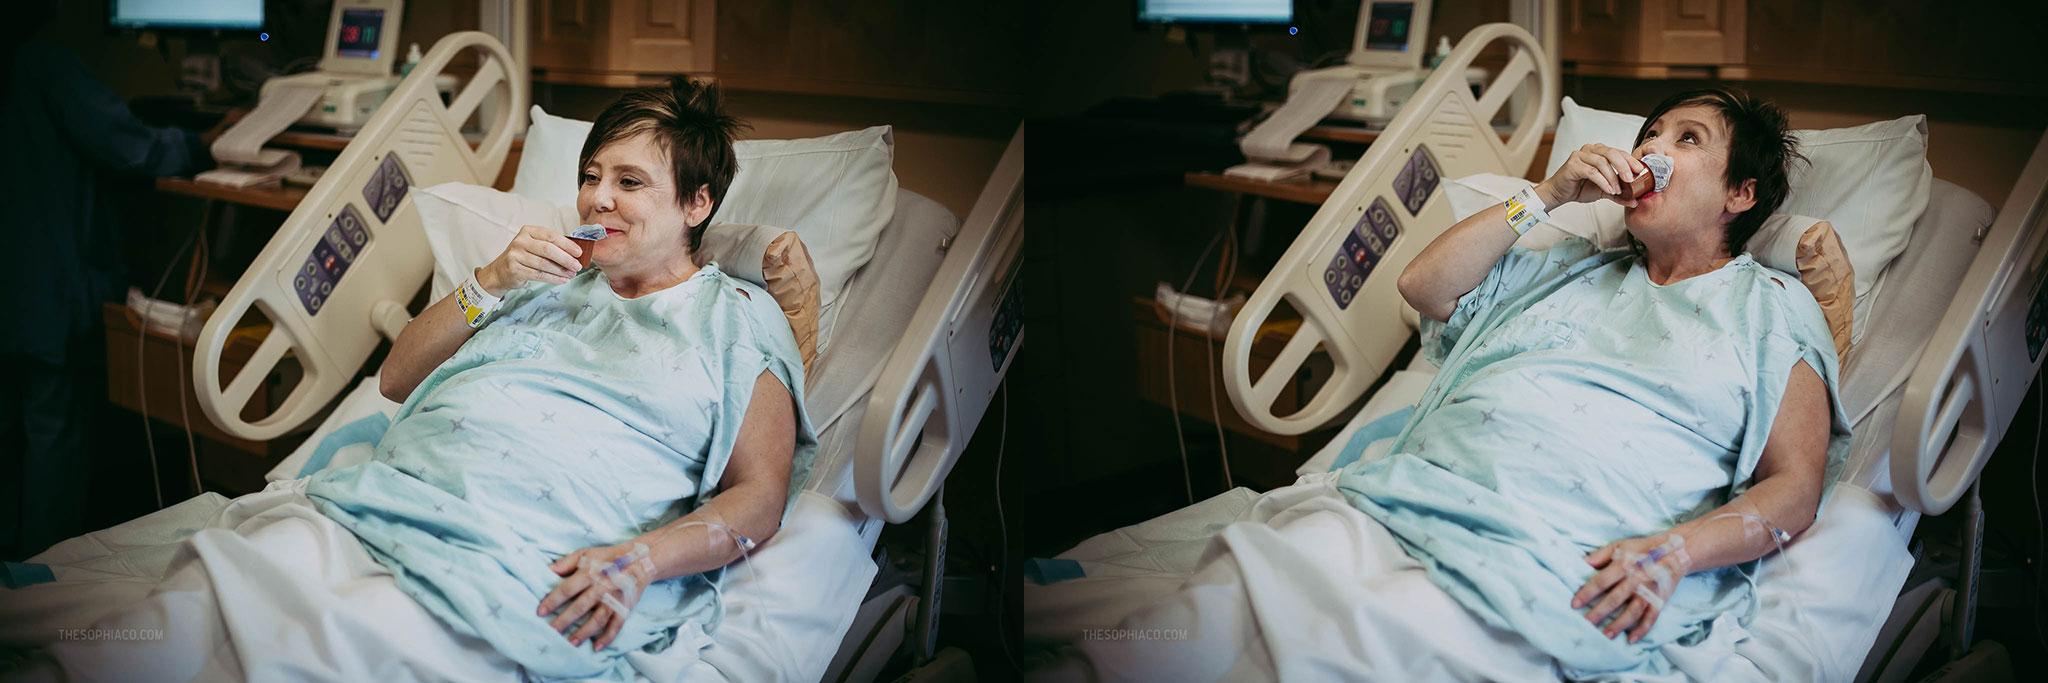 Oahu-Birth-Photographer-scheduled-cesarean-kaiser-09.jpg